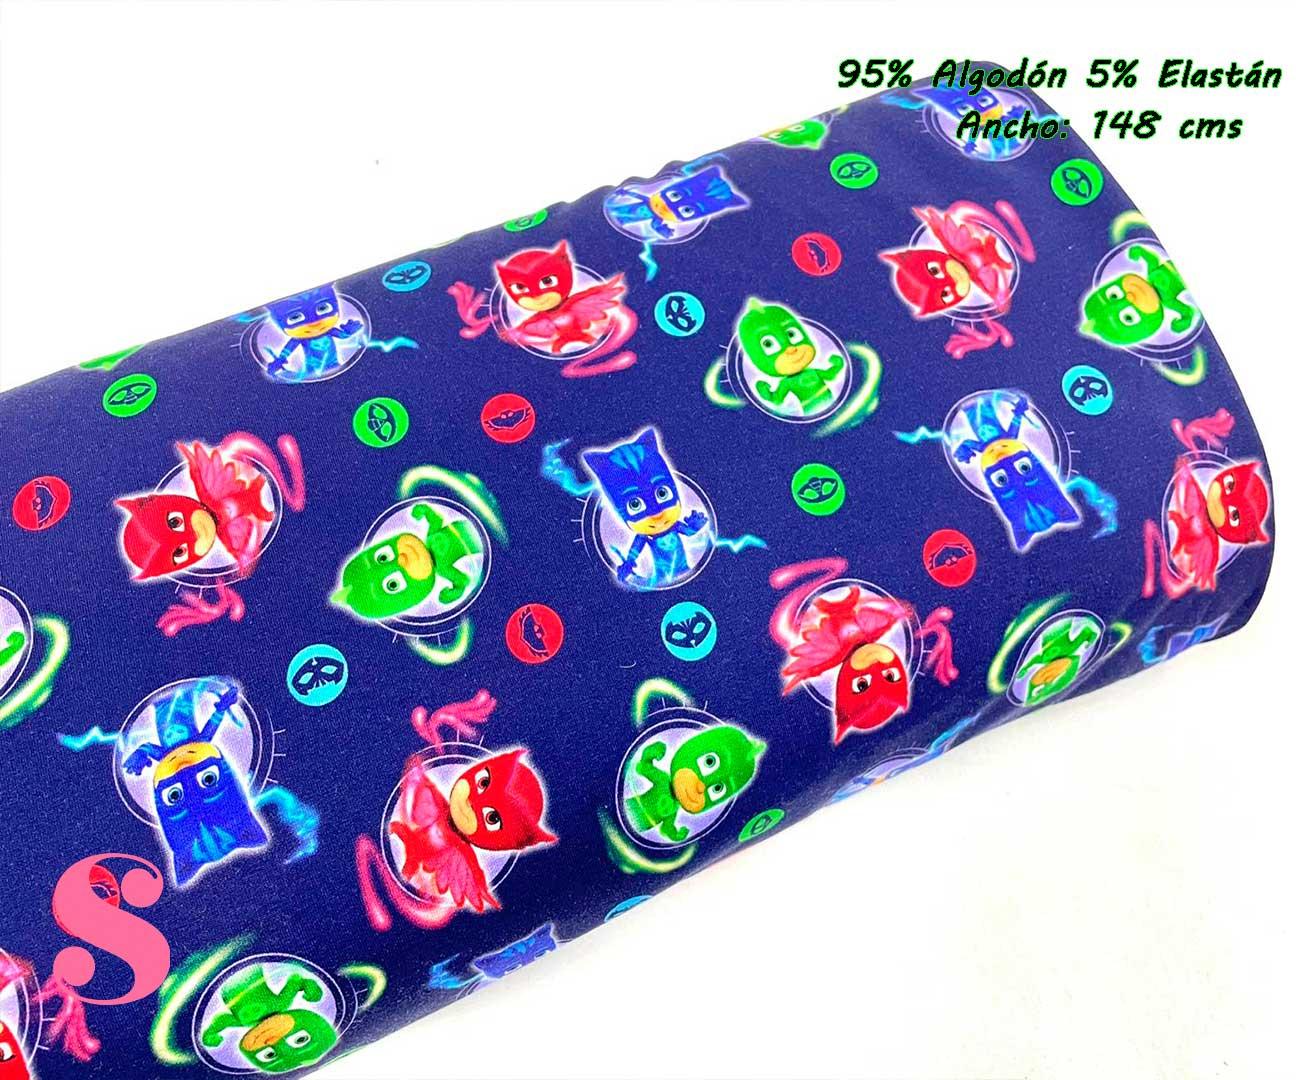 28-telas-de-punto-estampadas,punto-camiseta-estampado,punto-sudadera-estampado,french-terry-estampado,Punto Sudadera French Terry PJ Masks